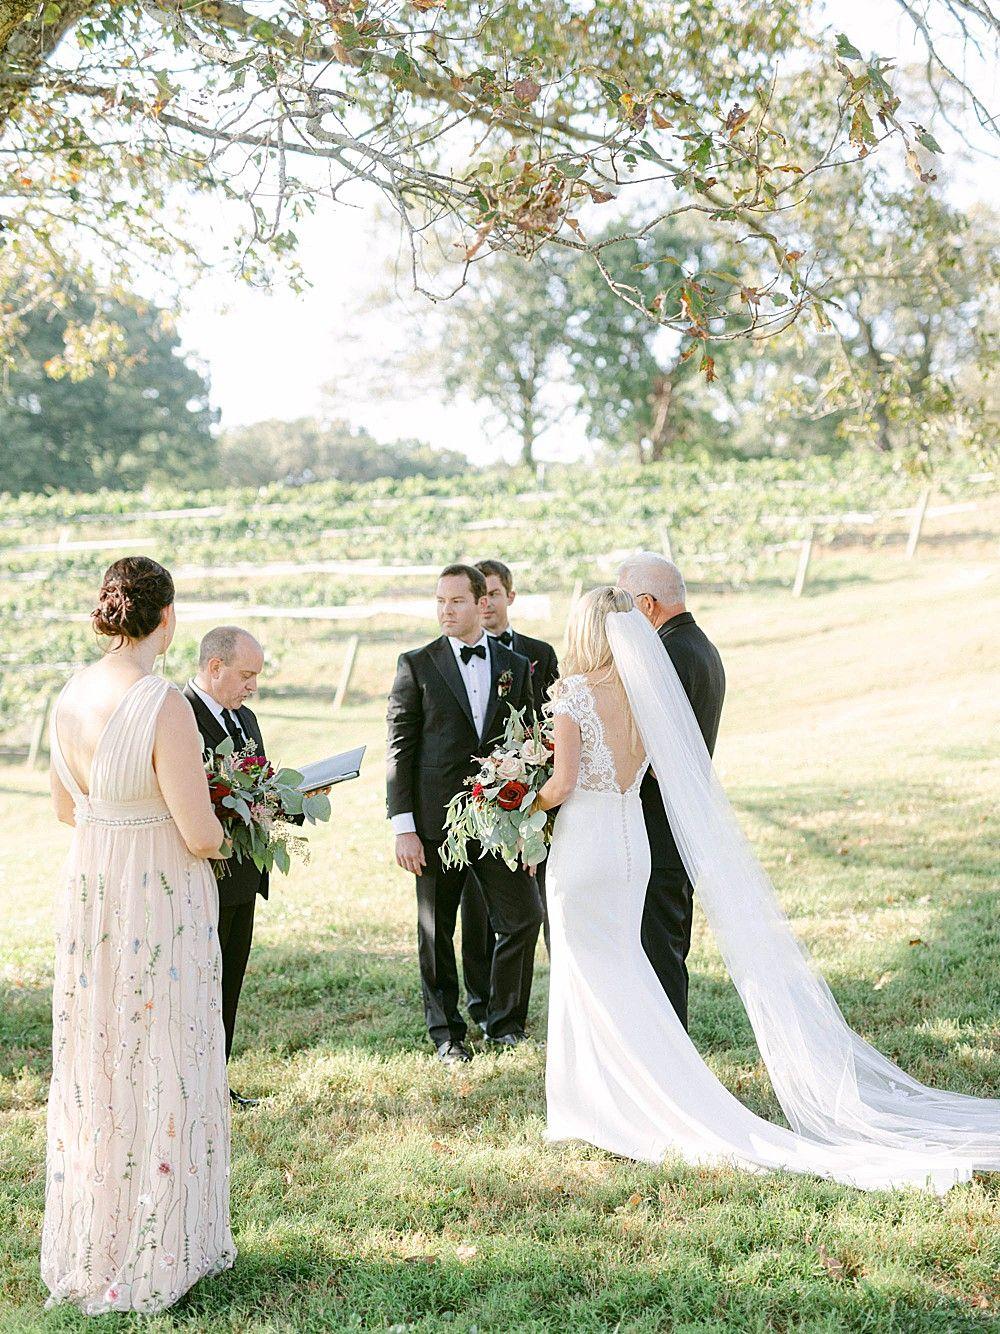 Blush And Merlot Wedding At Montaluce Winery In 2020 Merlot Wedding Winery Weddings North Georgia Wedding